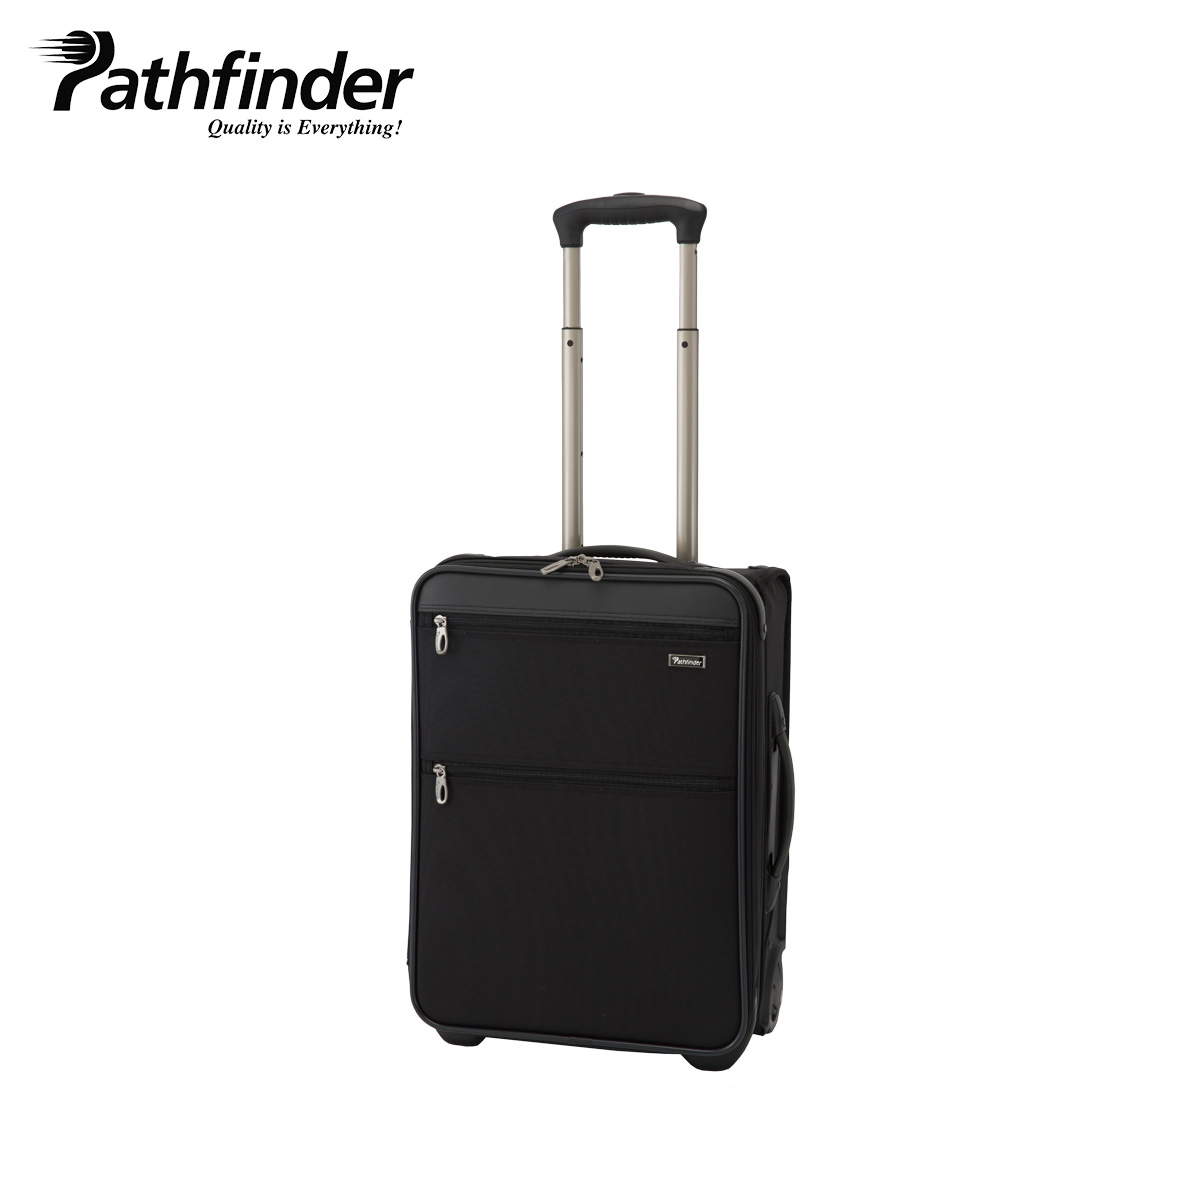 Pathfinder REVOLUTION XT パスファインダー バッグ キャリーケース キャリーバッグ スーツケース 30L-44L メンズ 機内持ち込み ソフト 拡張 ブラック 黒 PF6819DAXB